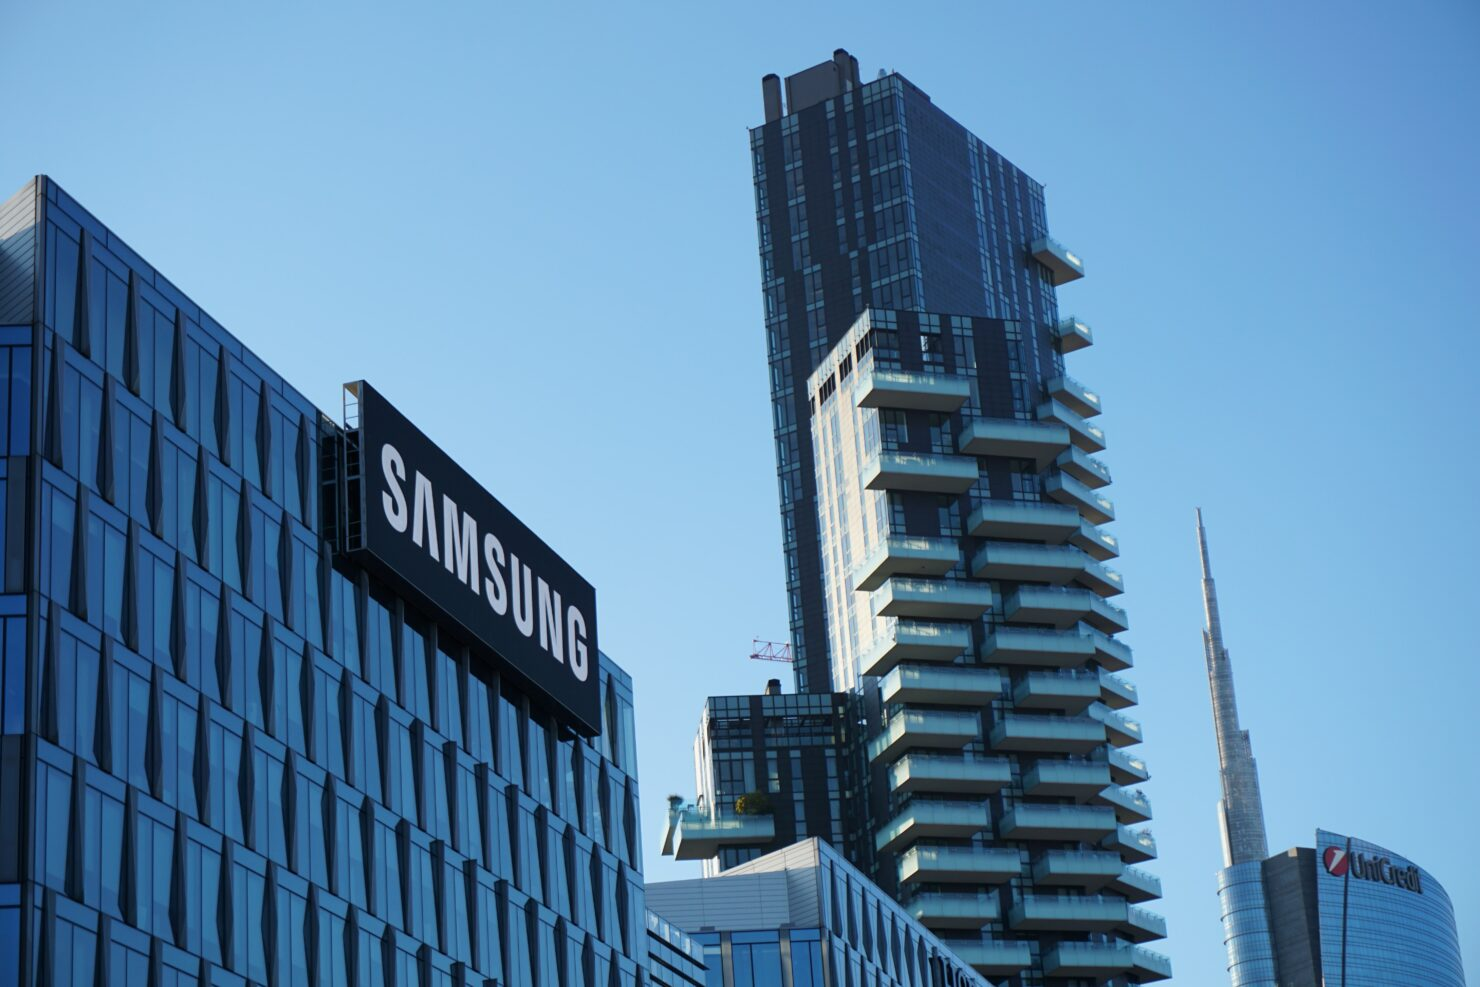 Samsung Deserve Credit Should Pixel 6 Series is a Success